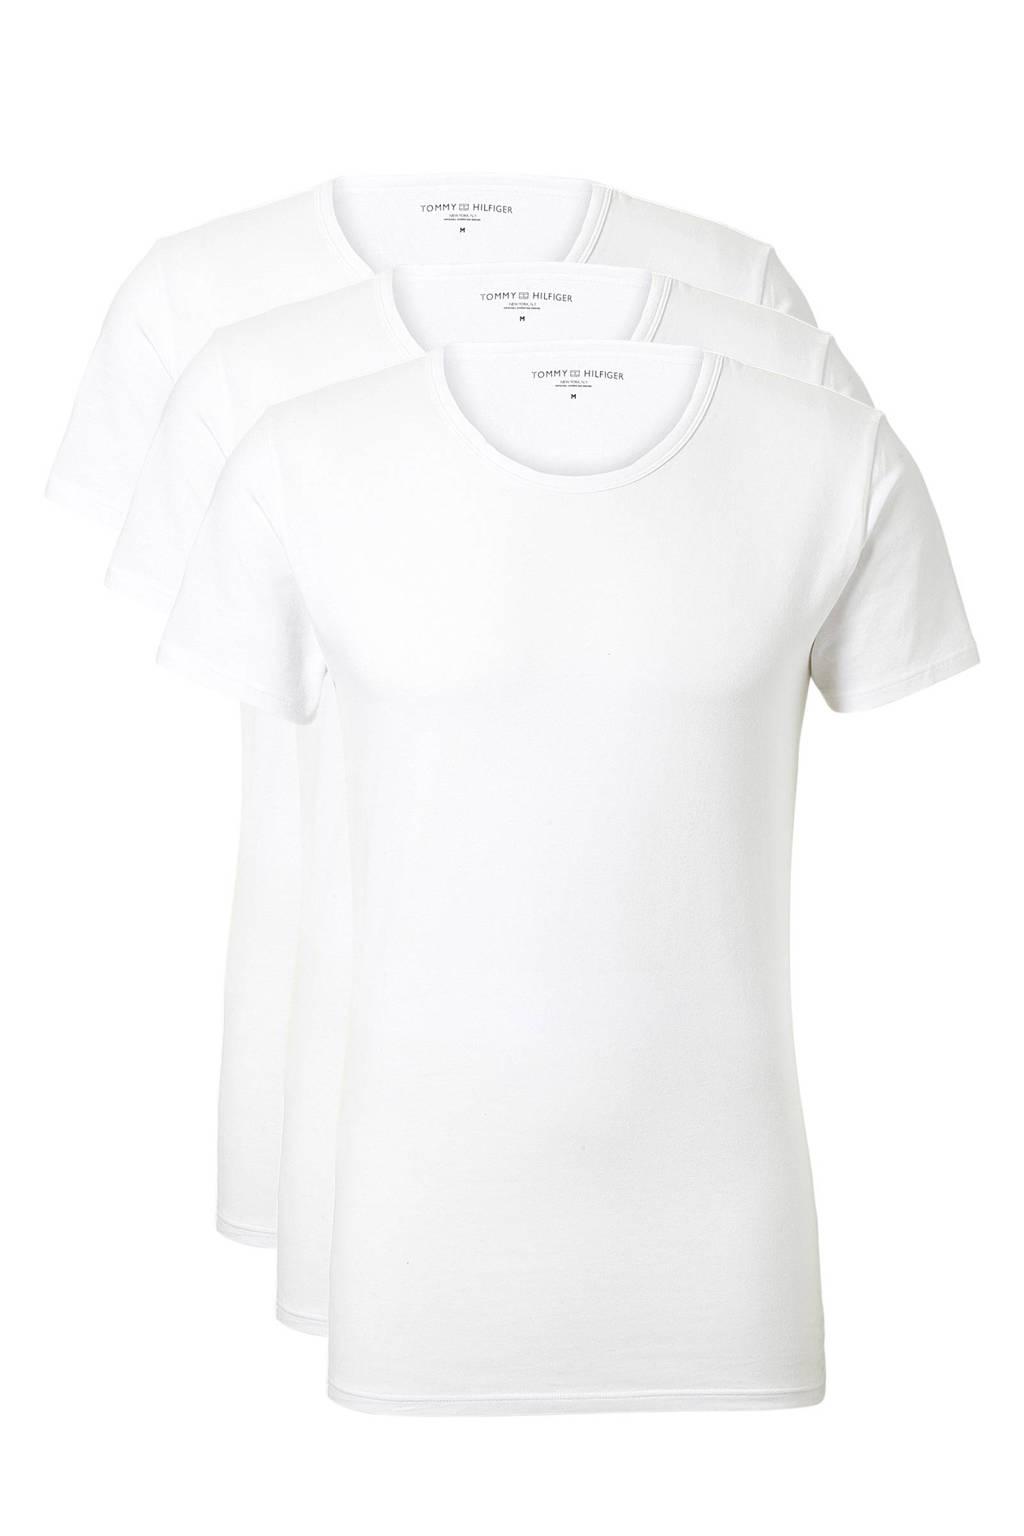 Tommy Hilfiger T-shirt (set van 3) wit, Wit